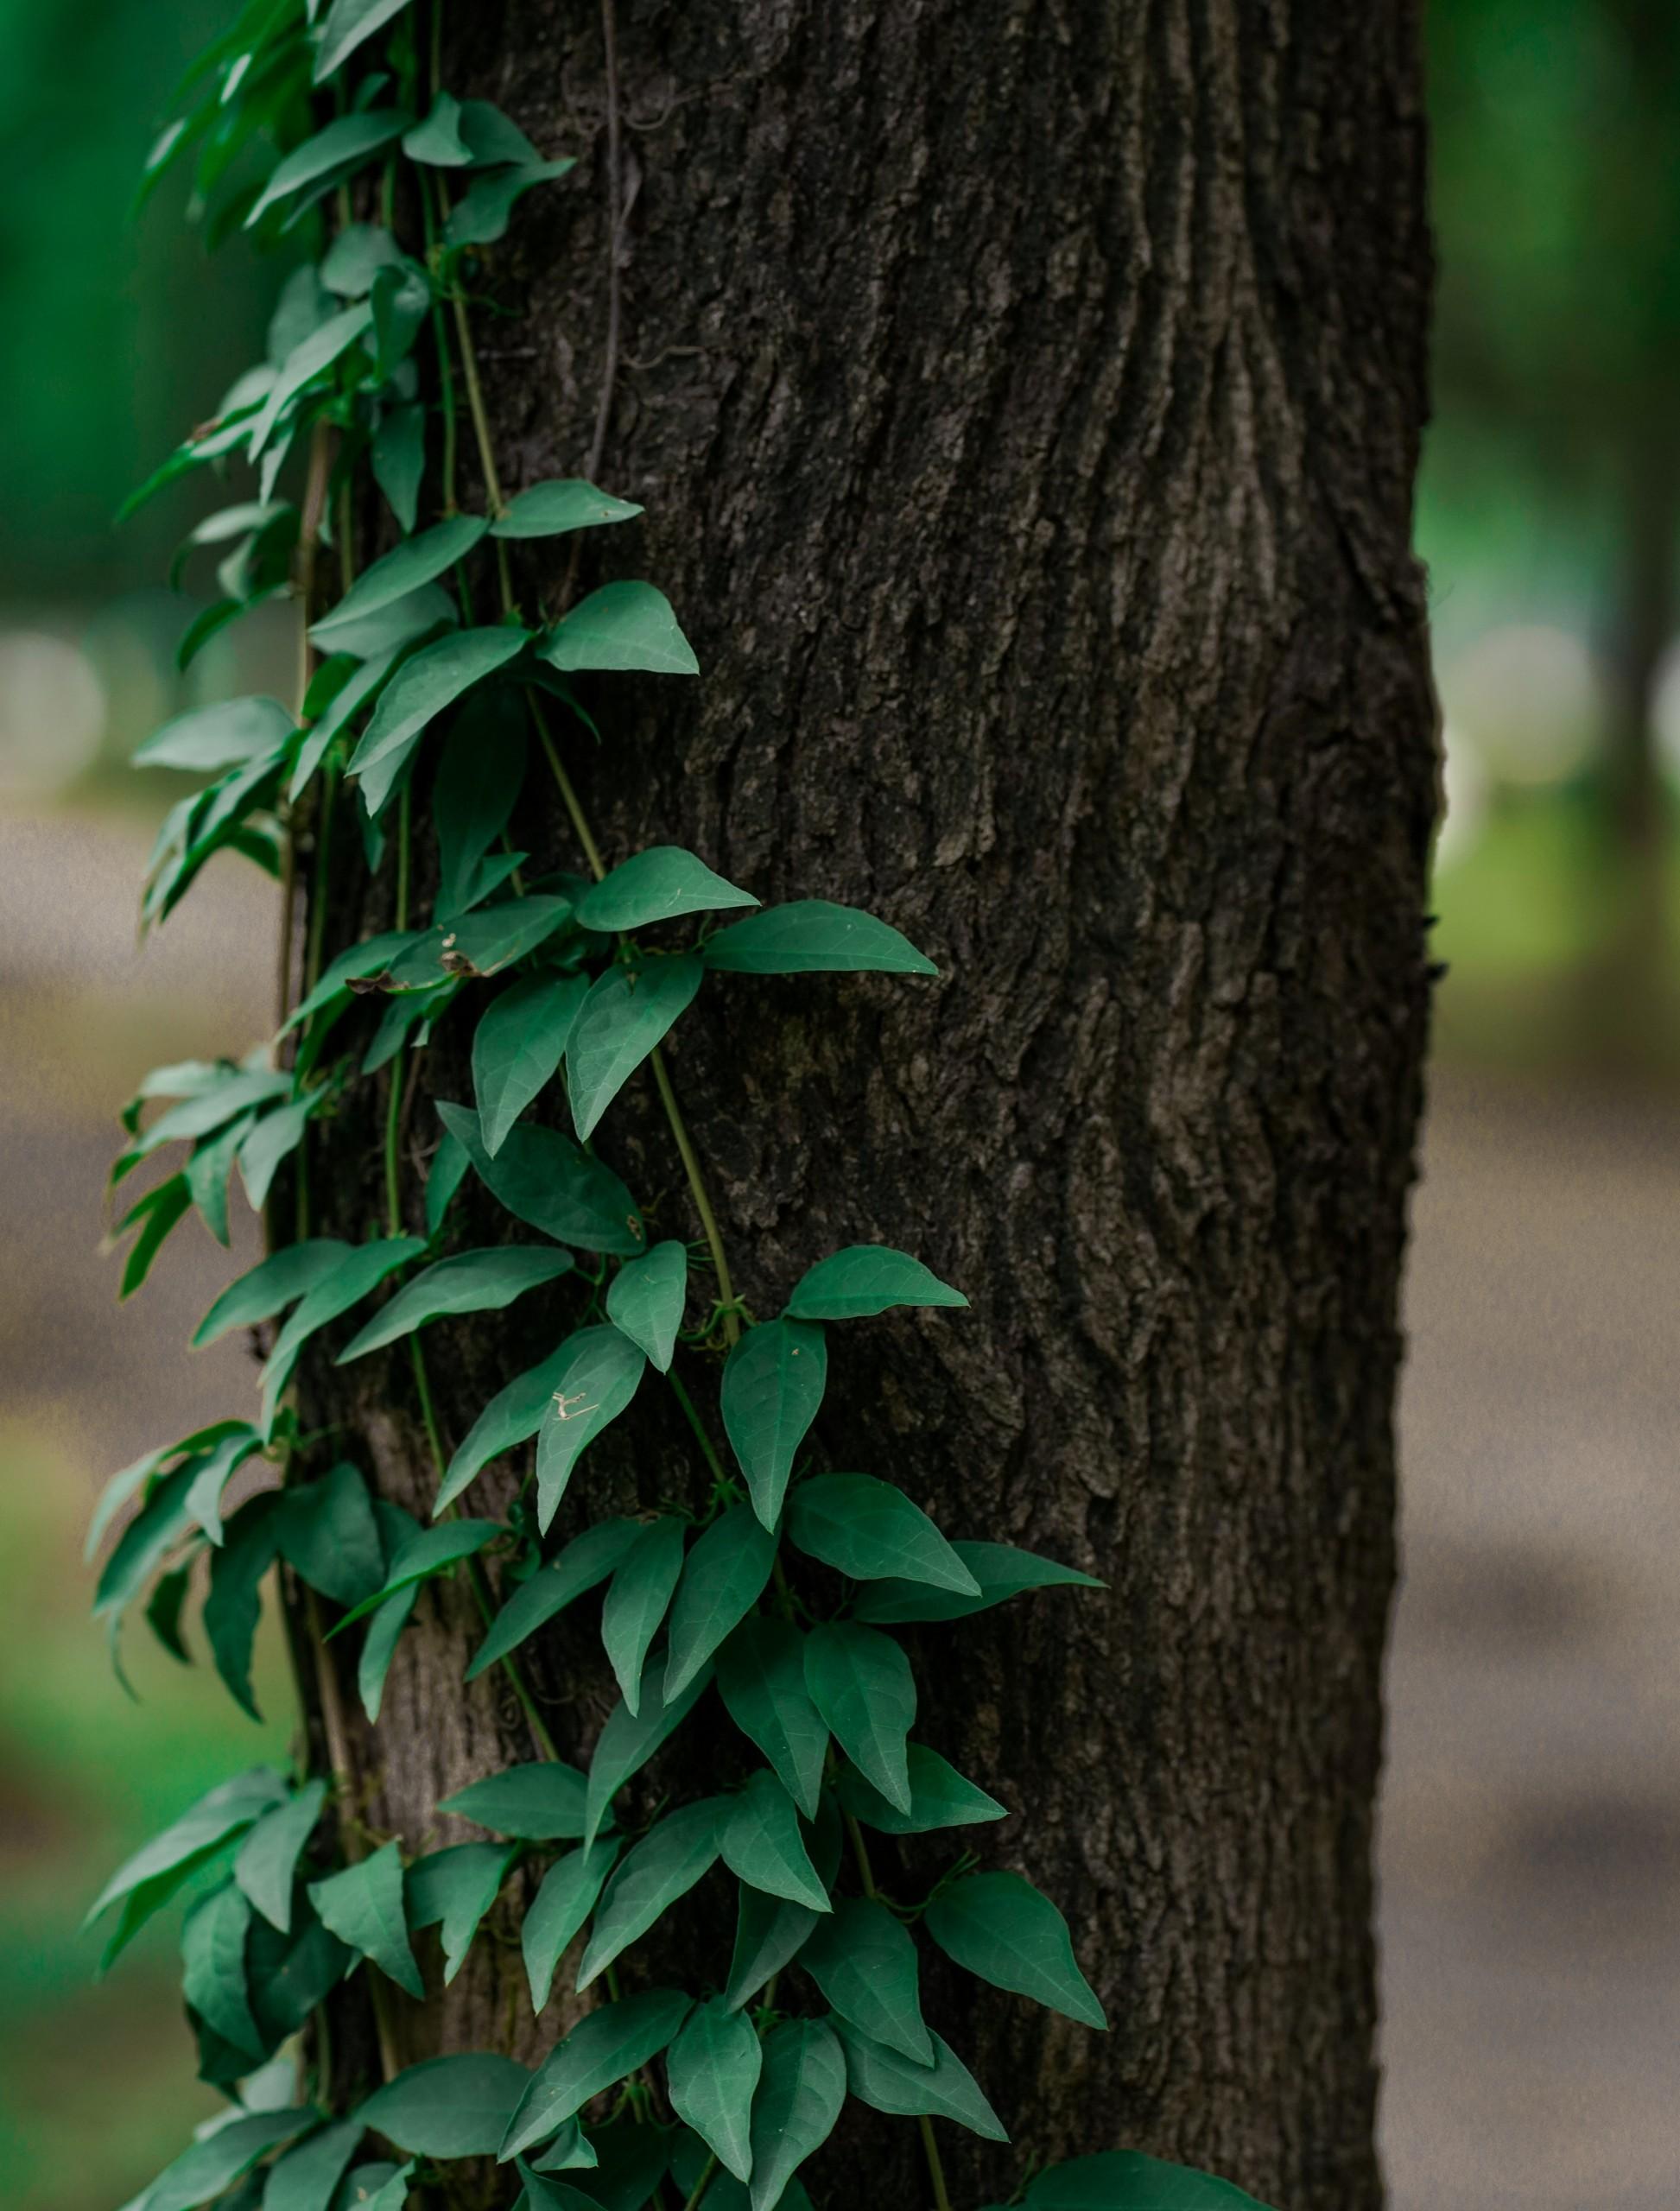 Climbing plant on Tree trunk